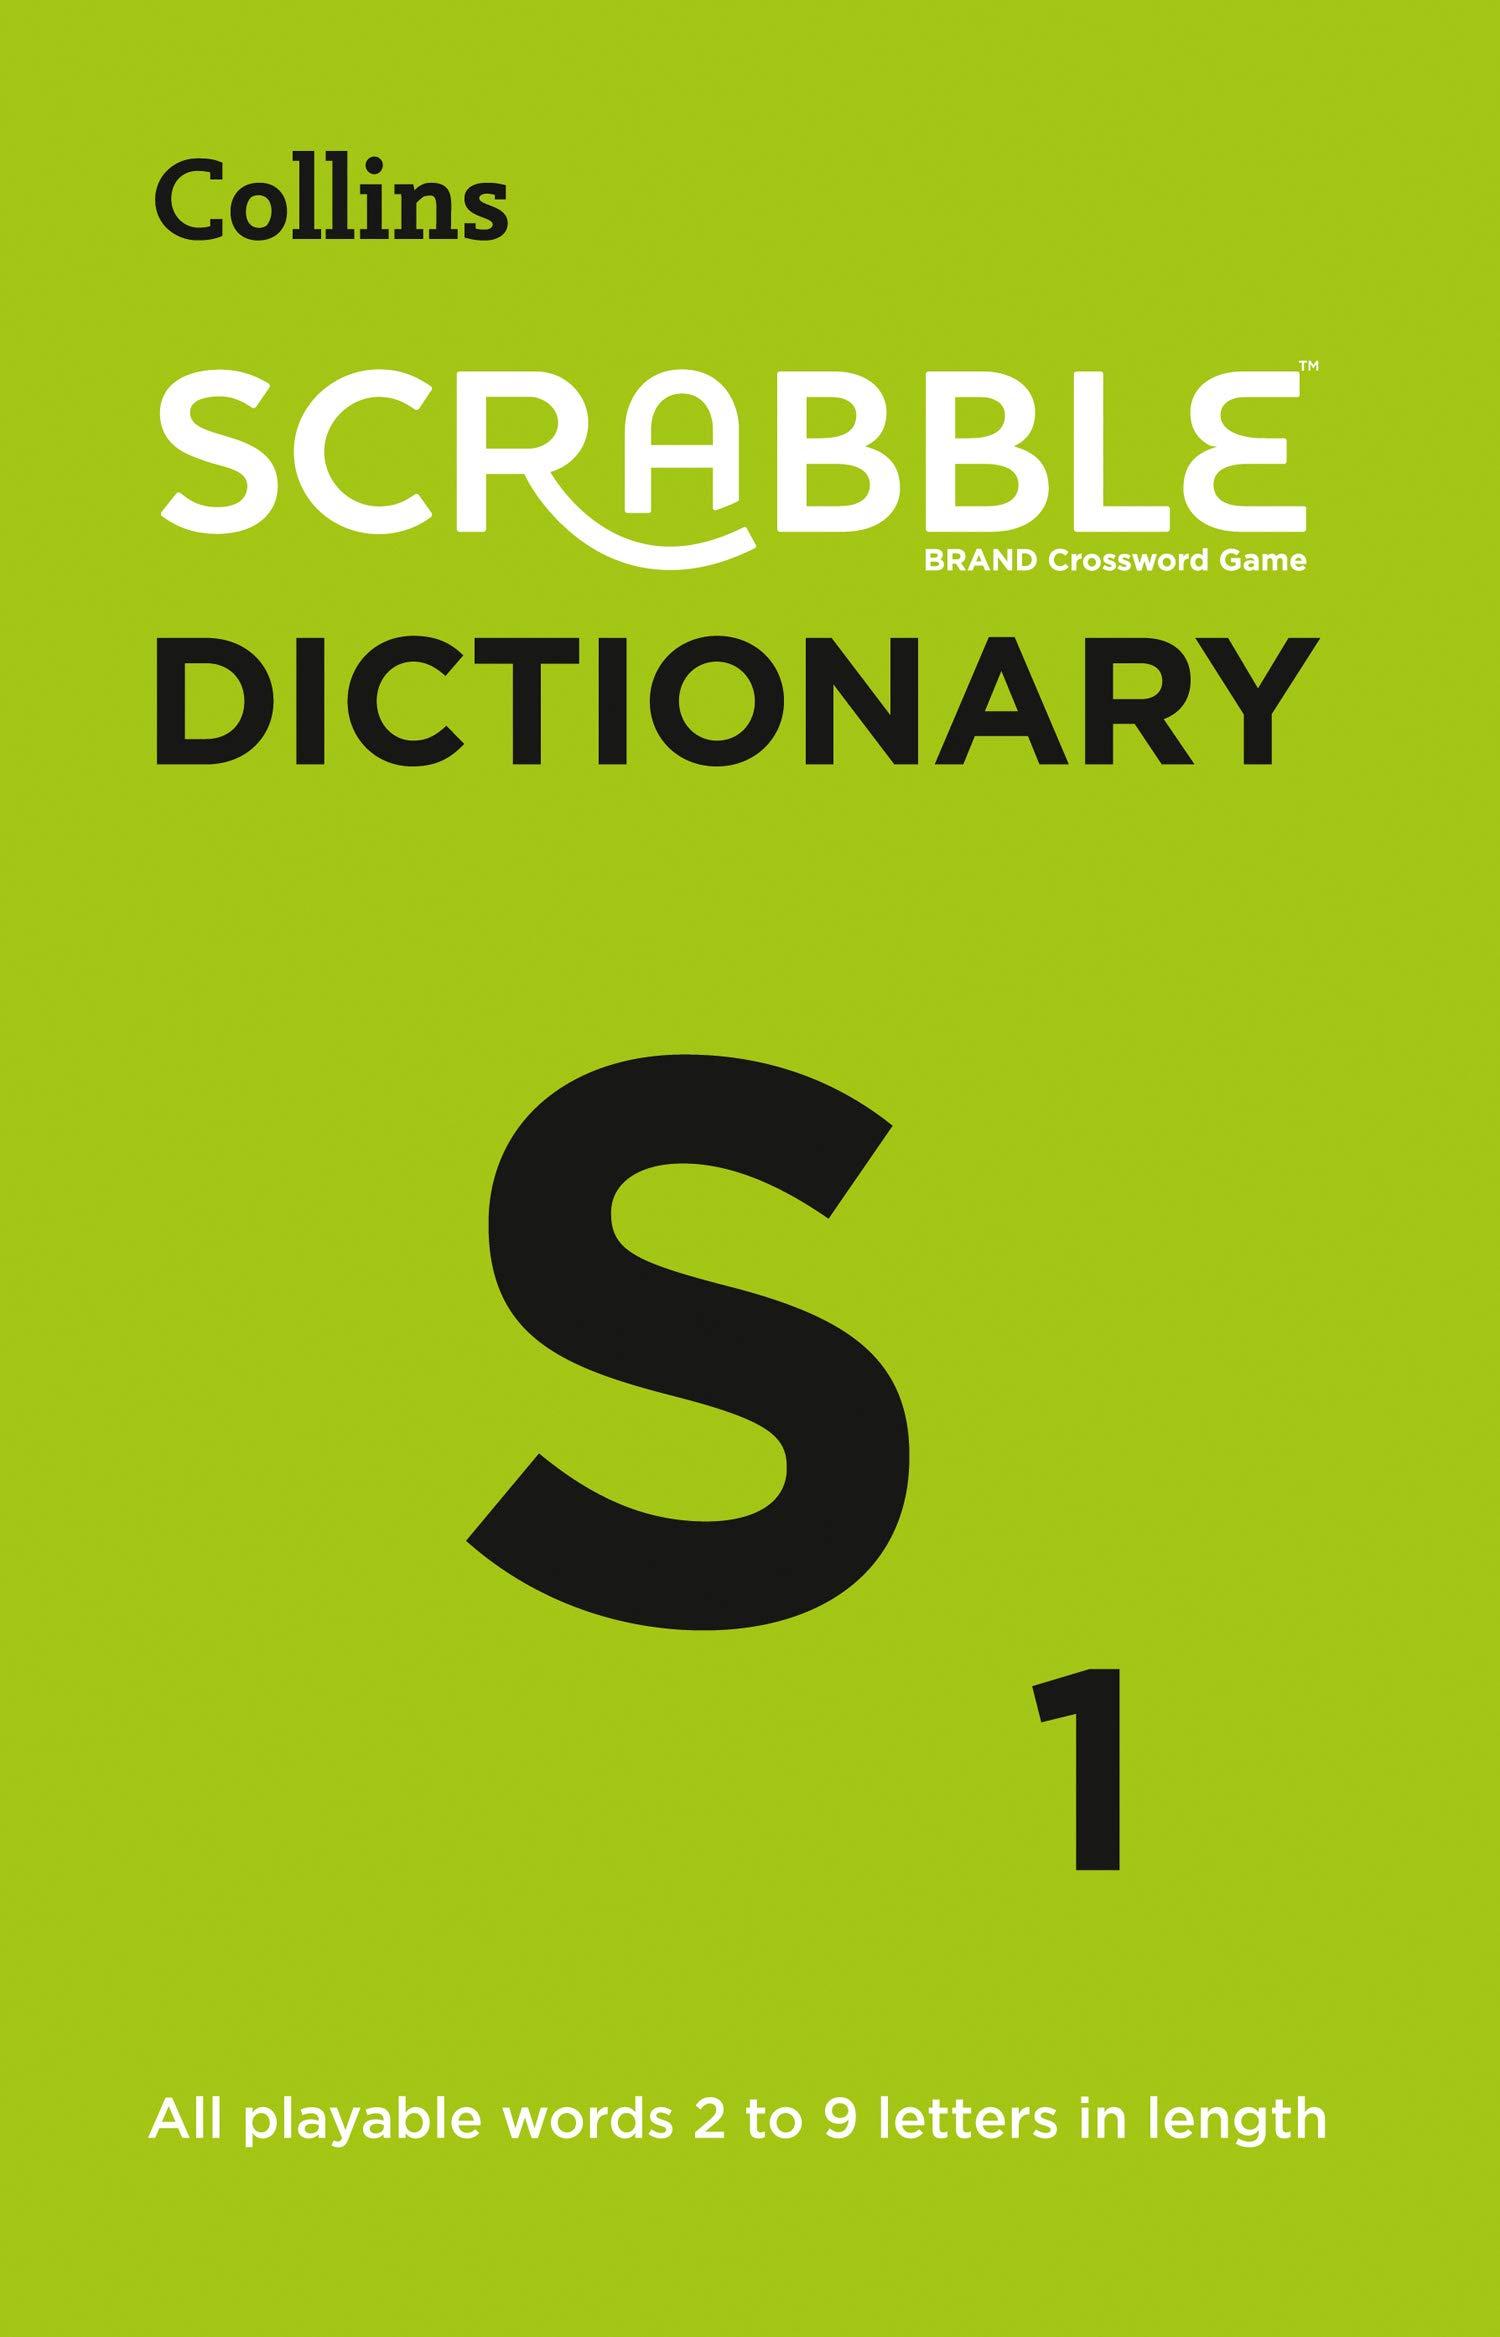 SCRABBLE® Dictionary: The official SCRABBLE® solver – all playable words 2 – 9 letters in length: Amazon.es: Collins Dictionaries: Libros en idiomas extranjeros